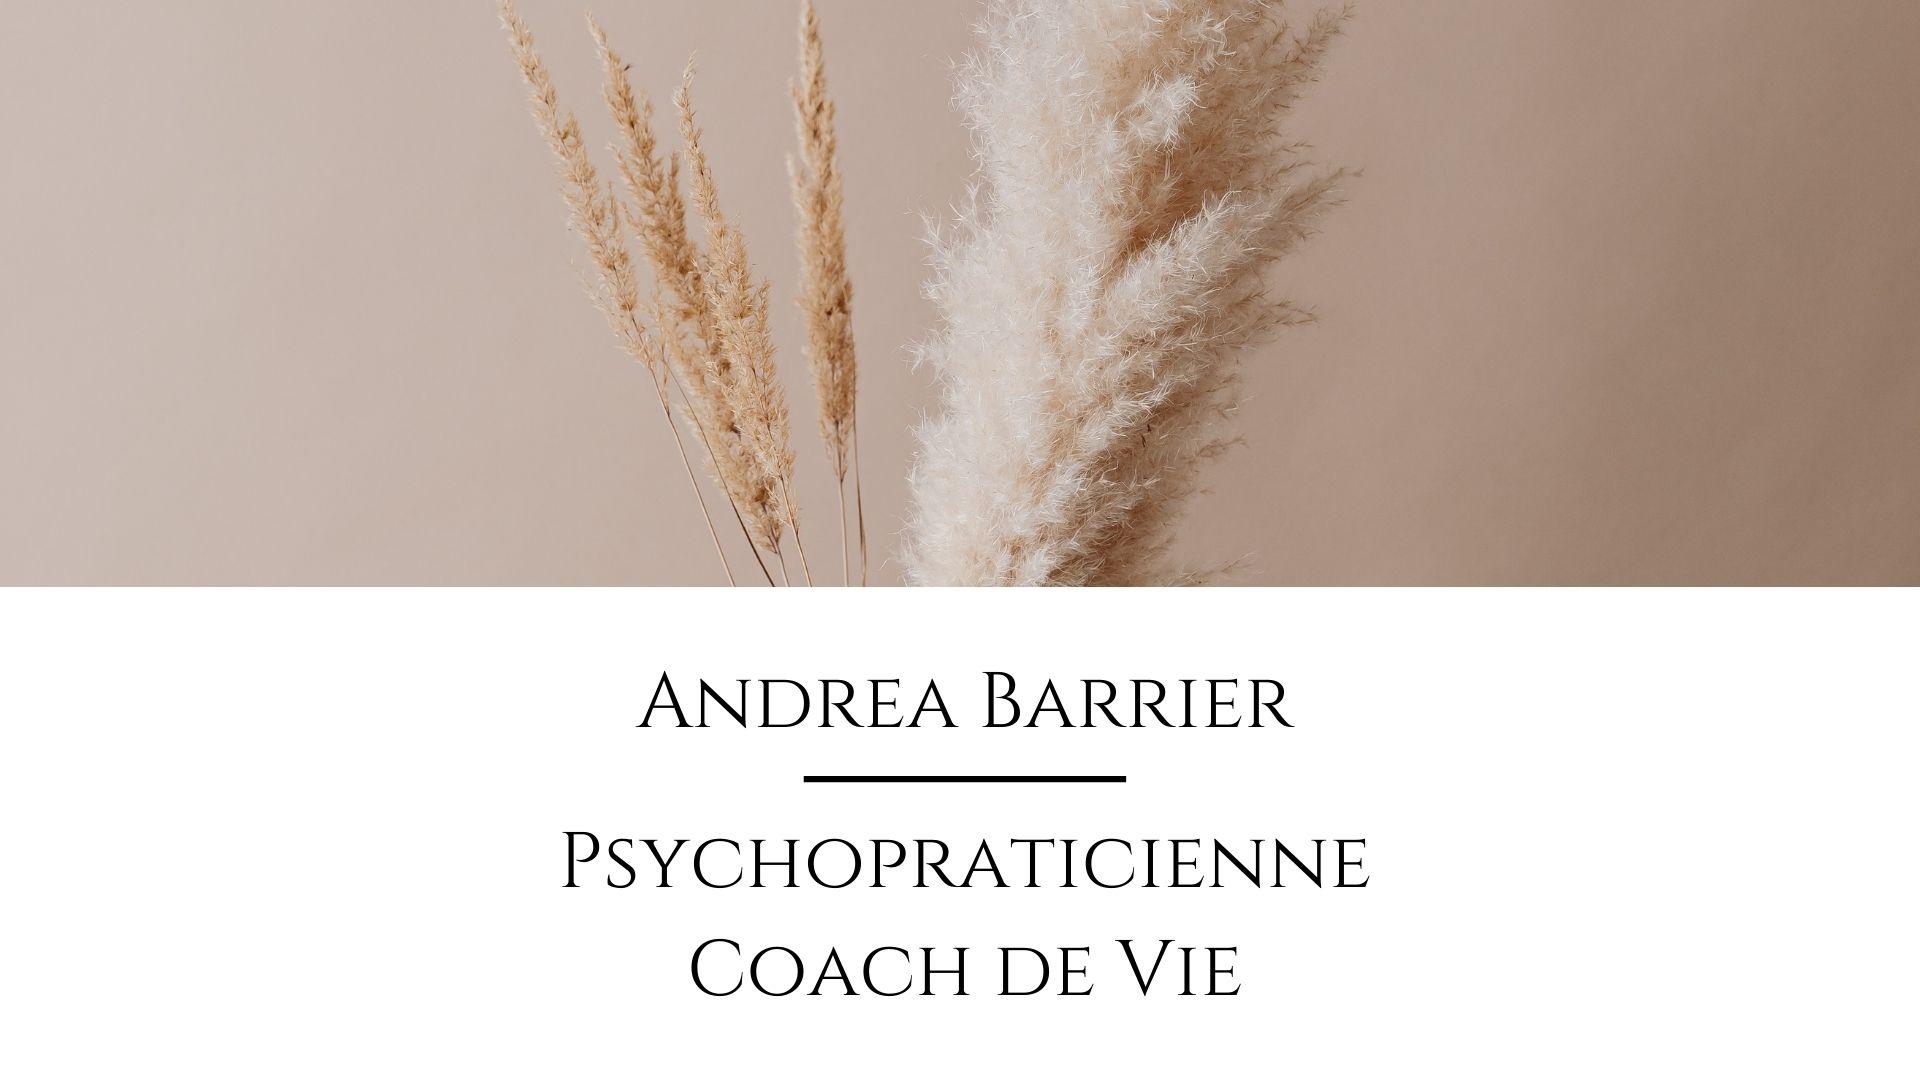 ANDREA BARRIER – COACH DE VIE – PSYCHOPRATICIENNE